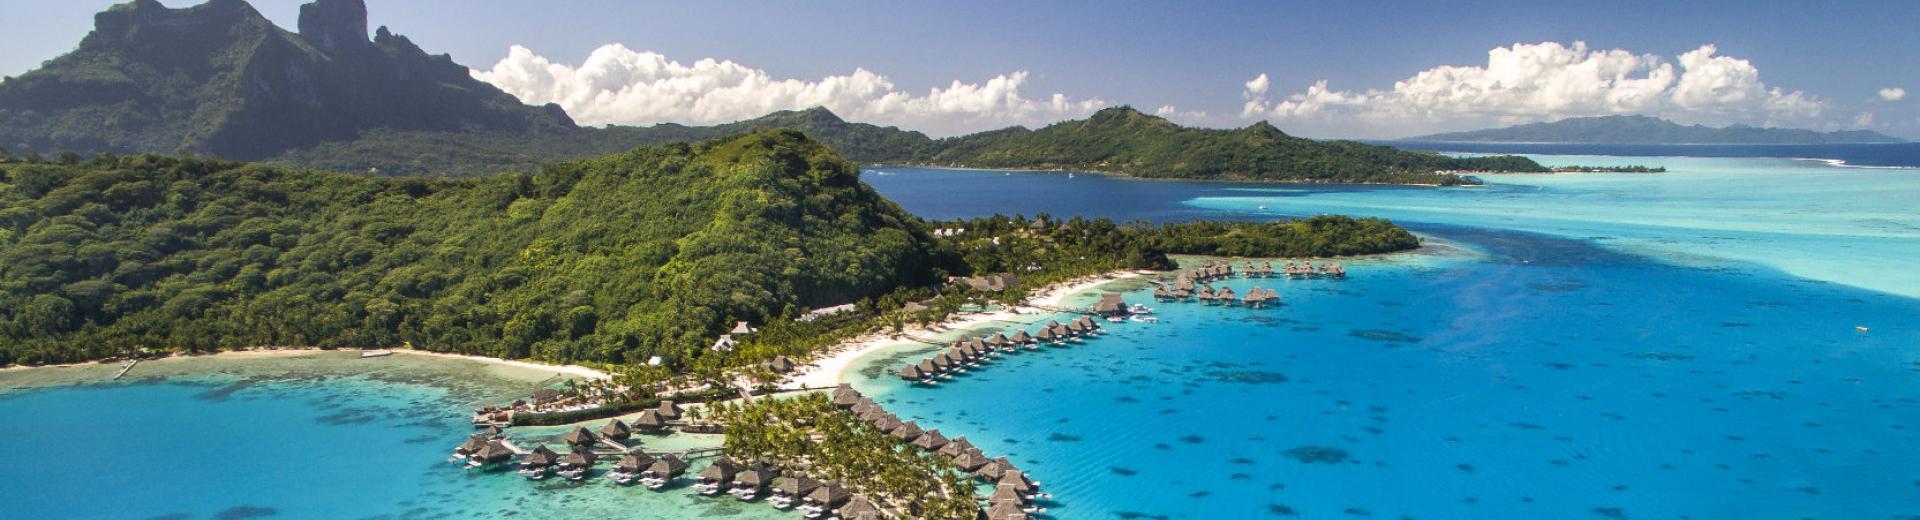 Beyond Overwater Bungalows Bora Bora Luxury Resorts